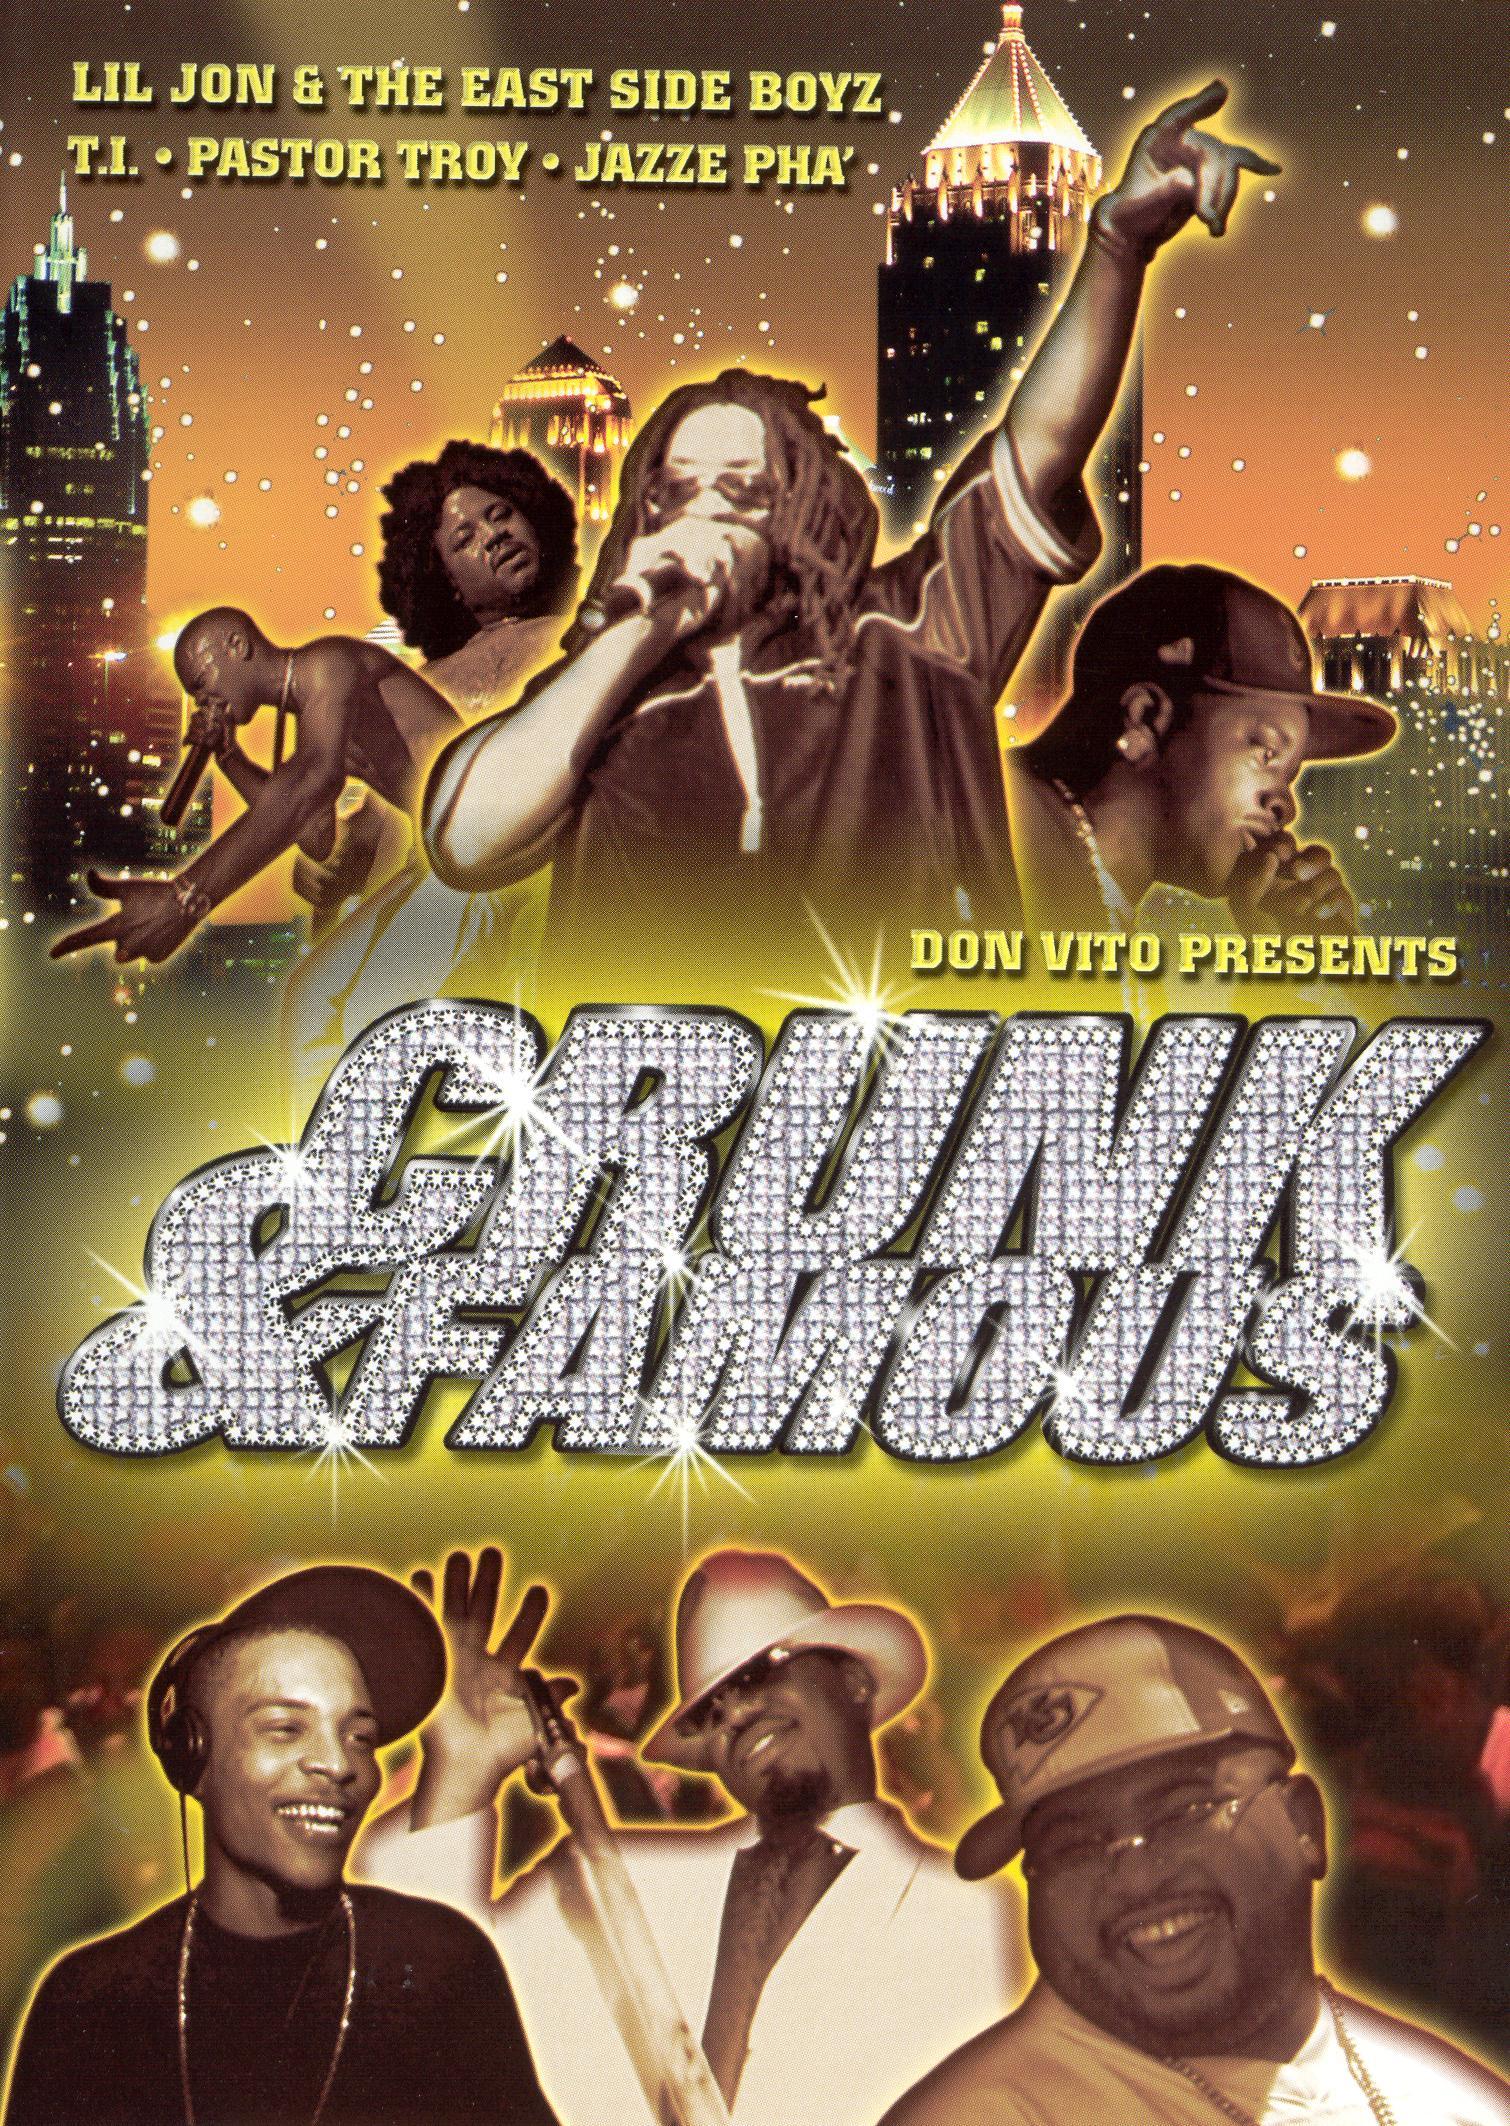 Don Vito Presents: Crunk & Famous